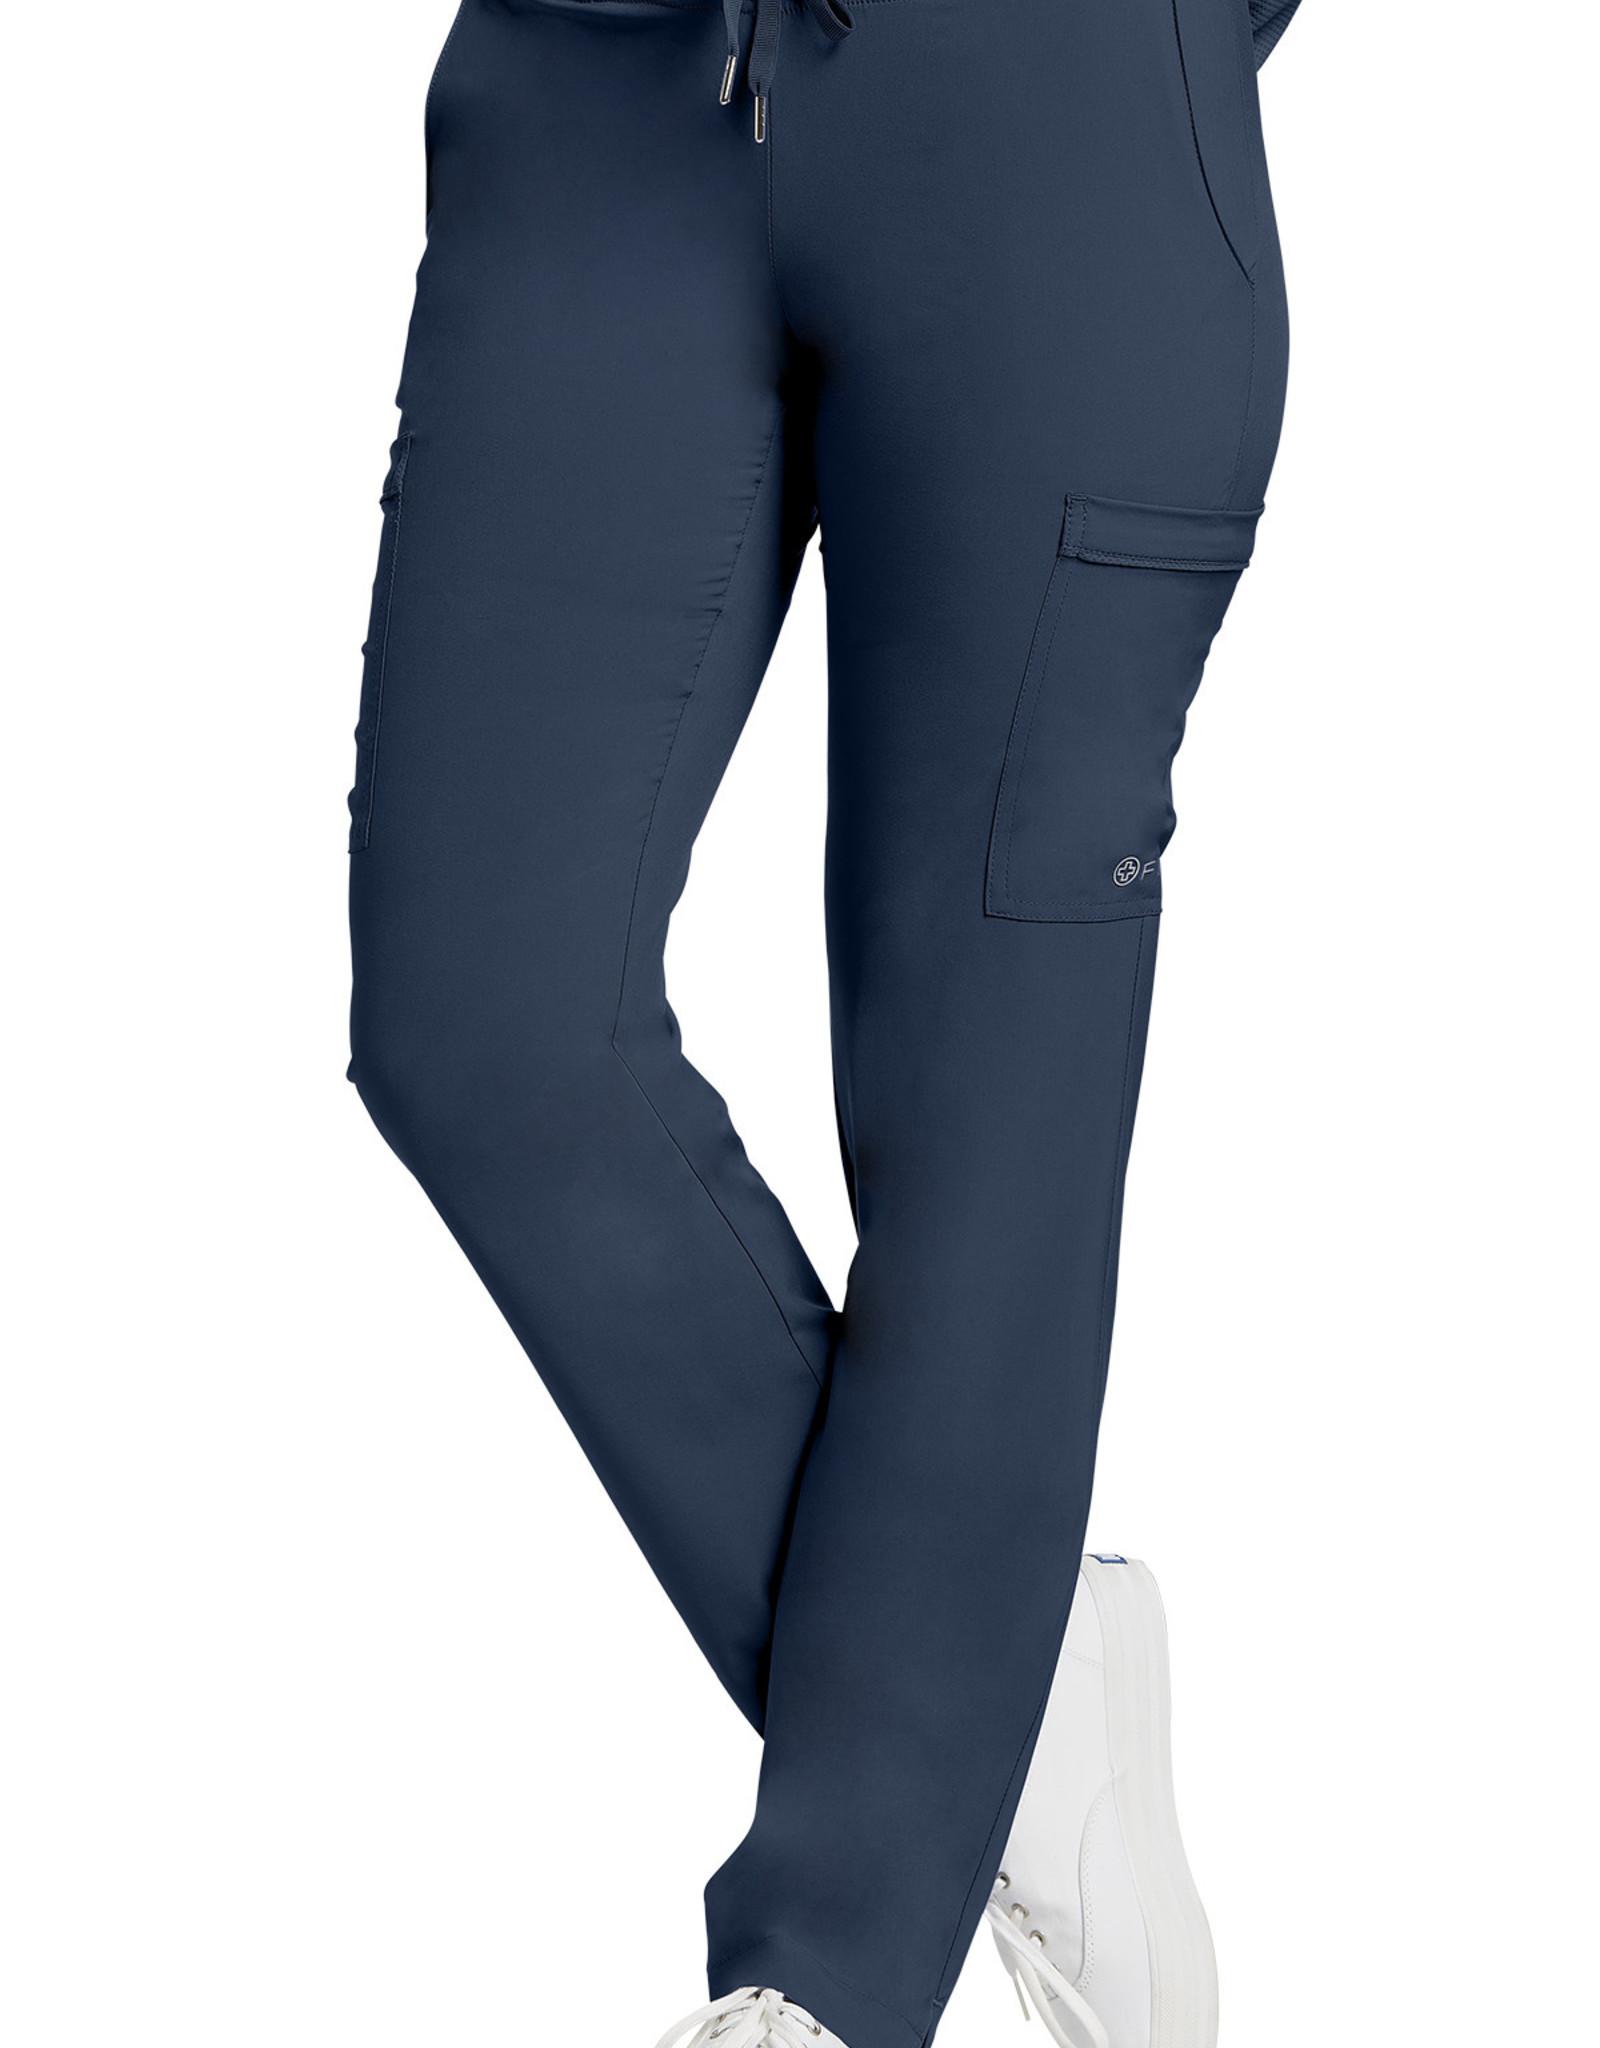 White Cross Fit Pantalon Cargo Fit 373